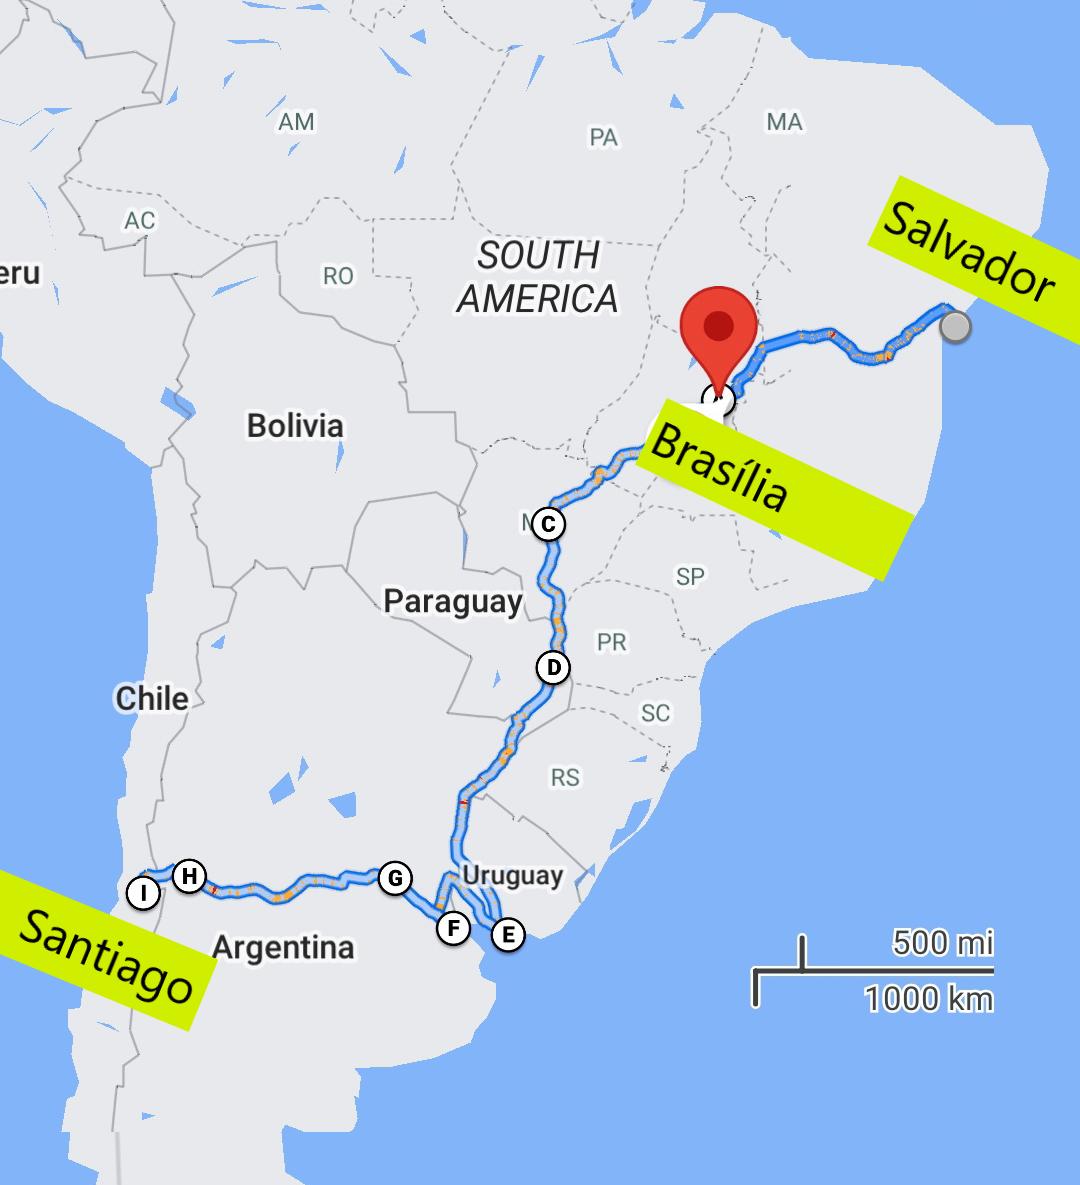 The next destination is Brasília / Source: Google Maps/